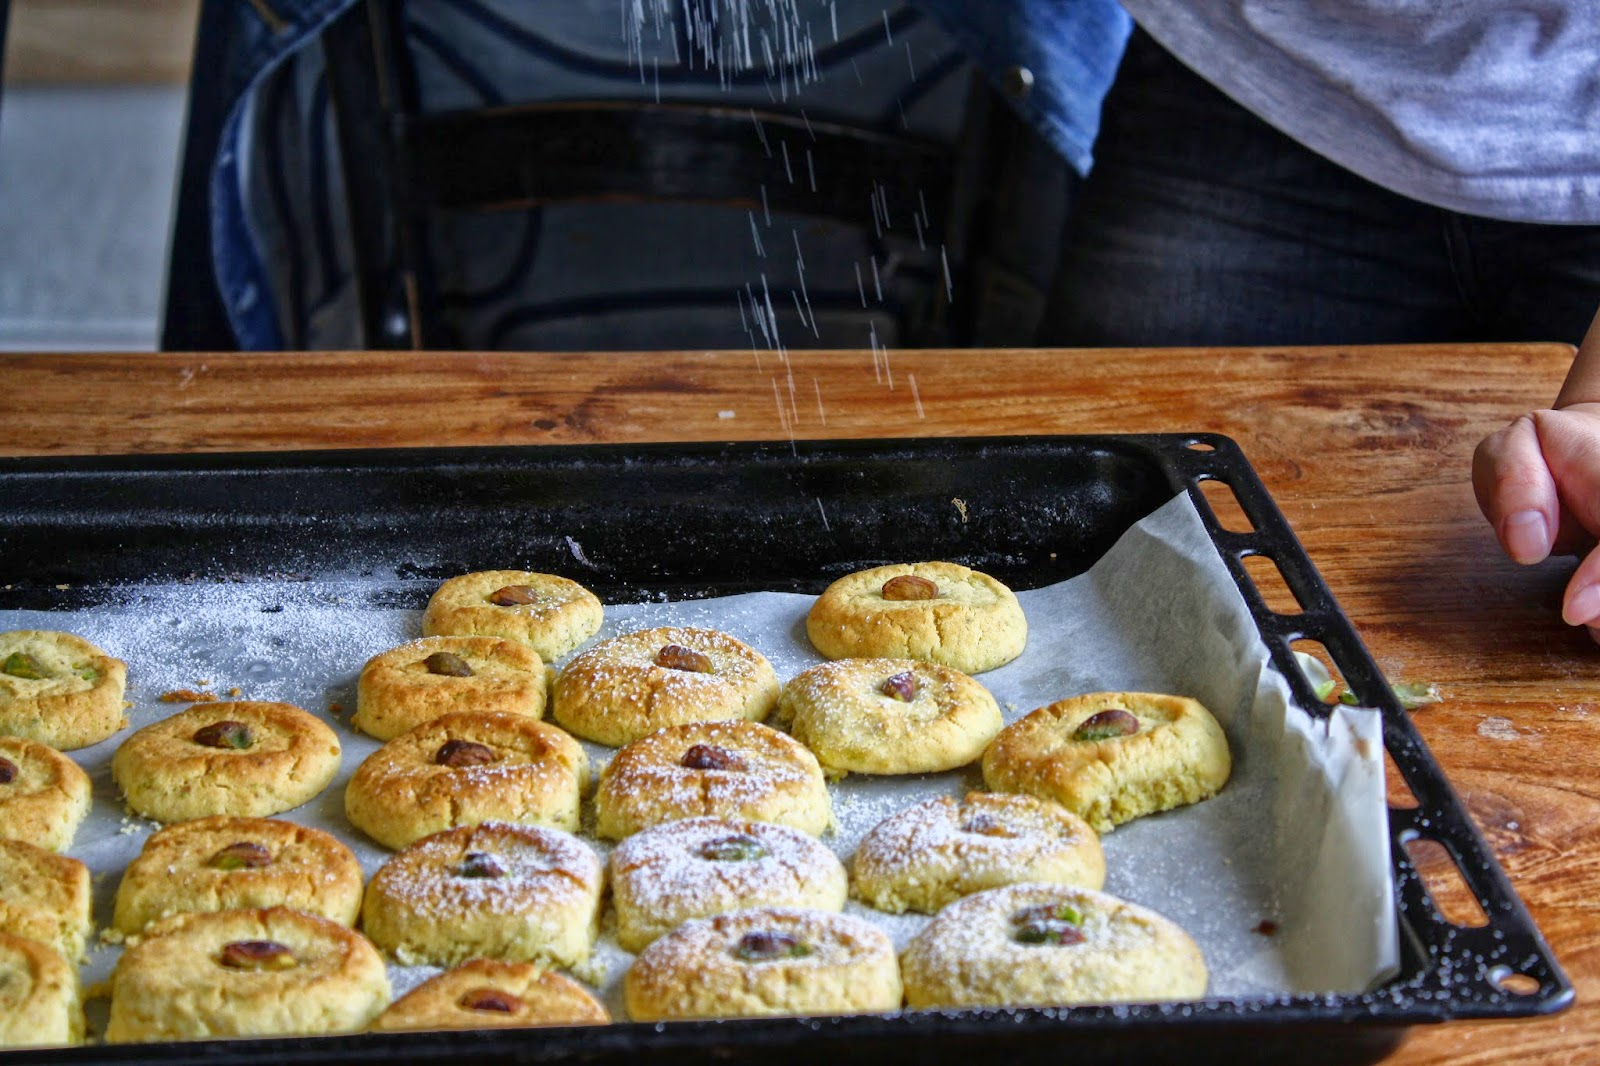 sifting icing sugar on the thumbprint cookies